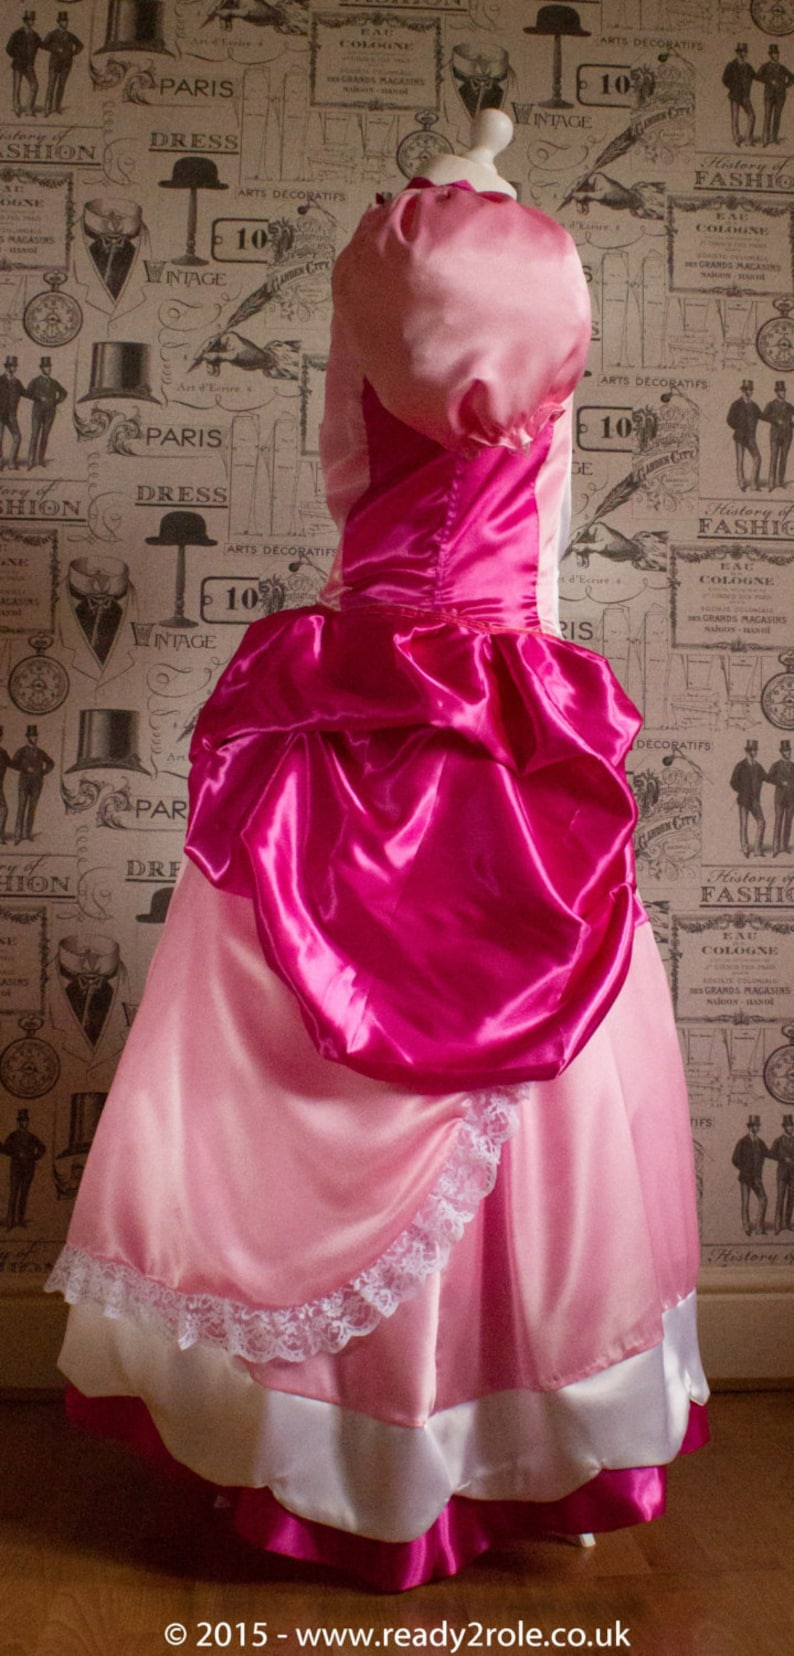 The Princess Peach Costume CW8yTP2a